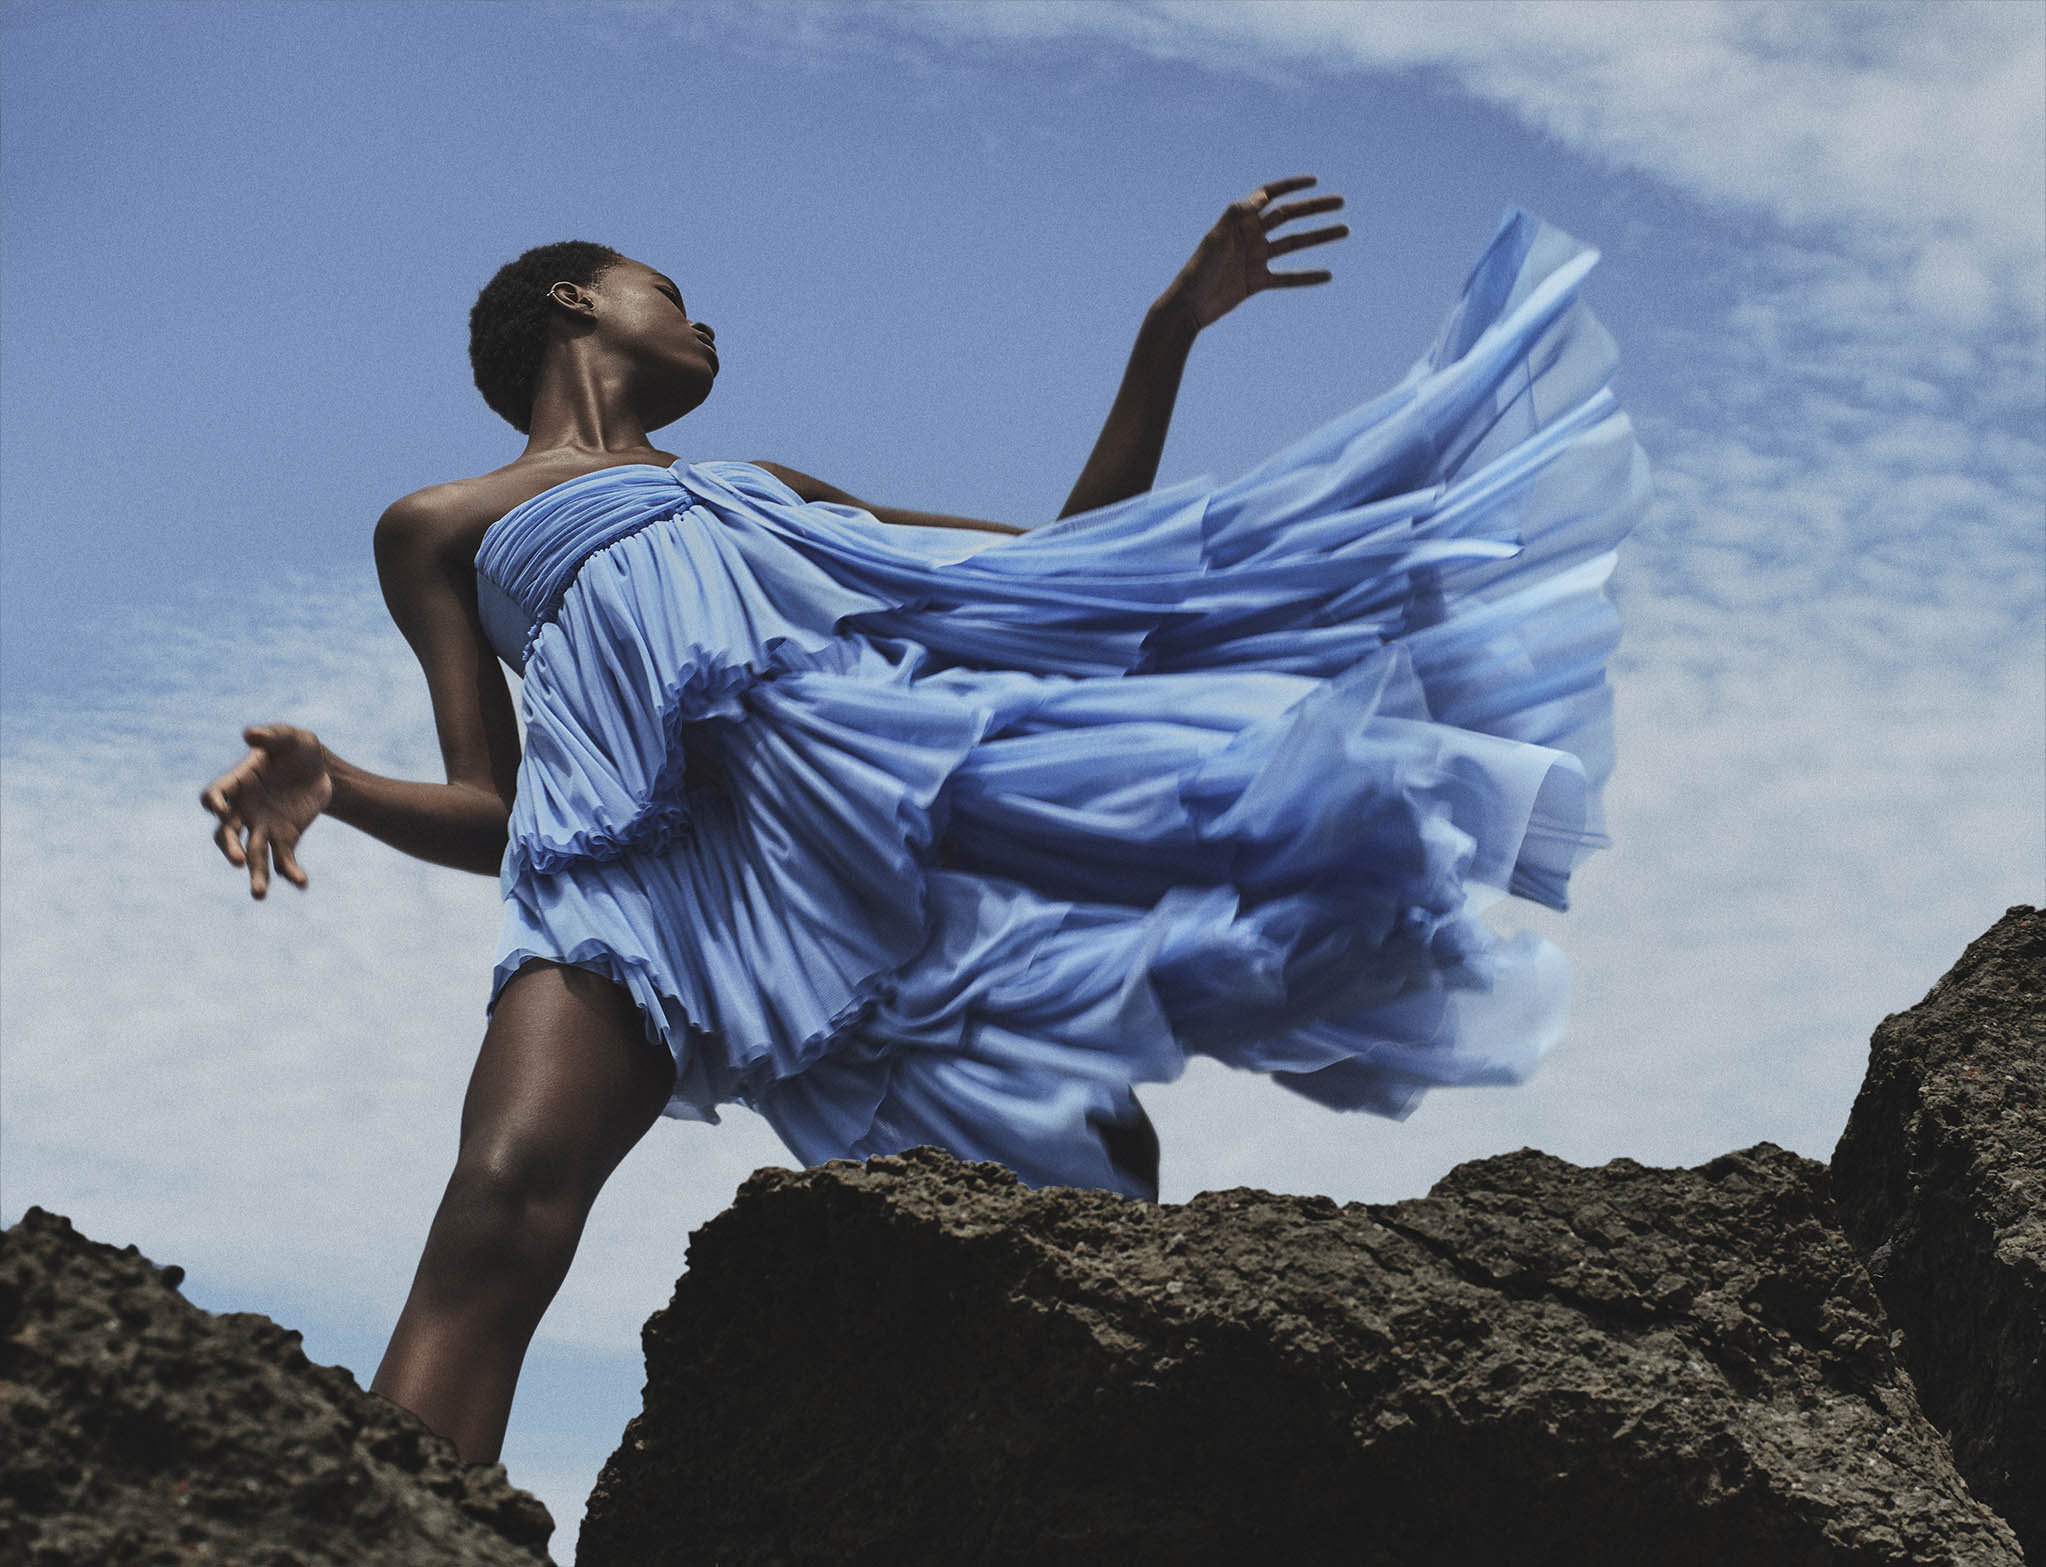 Mujer Hoy fotografía editorial chica piel oscura con vestido vaporoso azul sobre roca